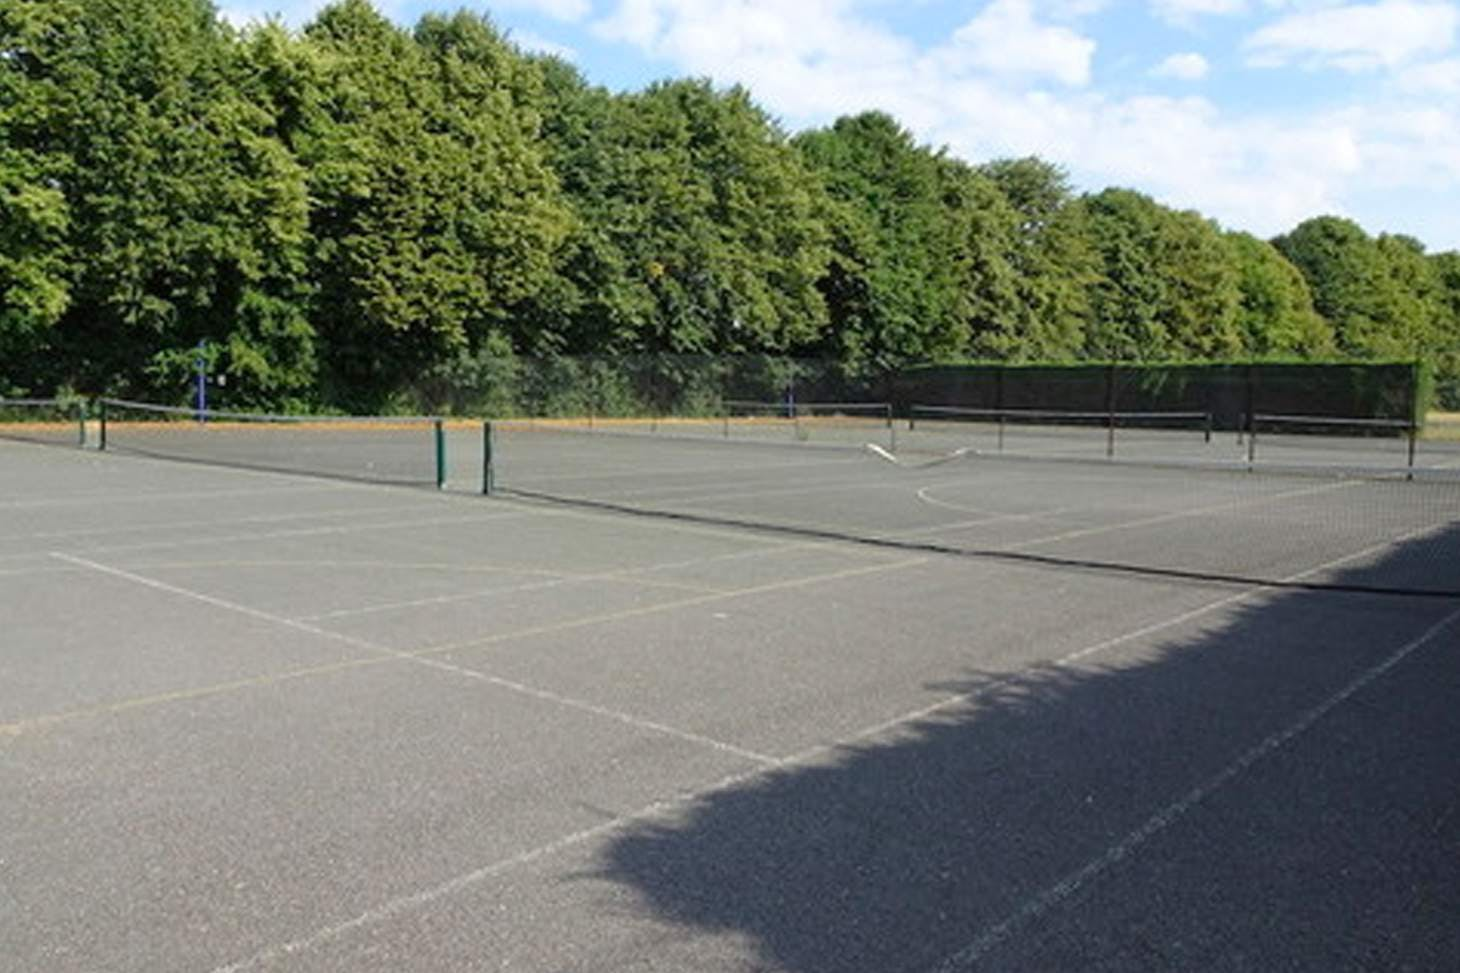 Wycombe High School Outdoor   Hard (macadam) netball court